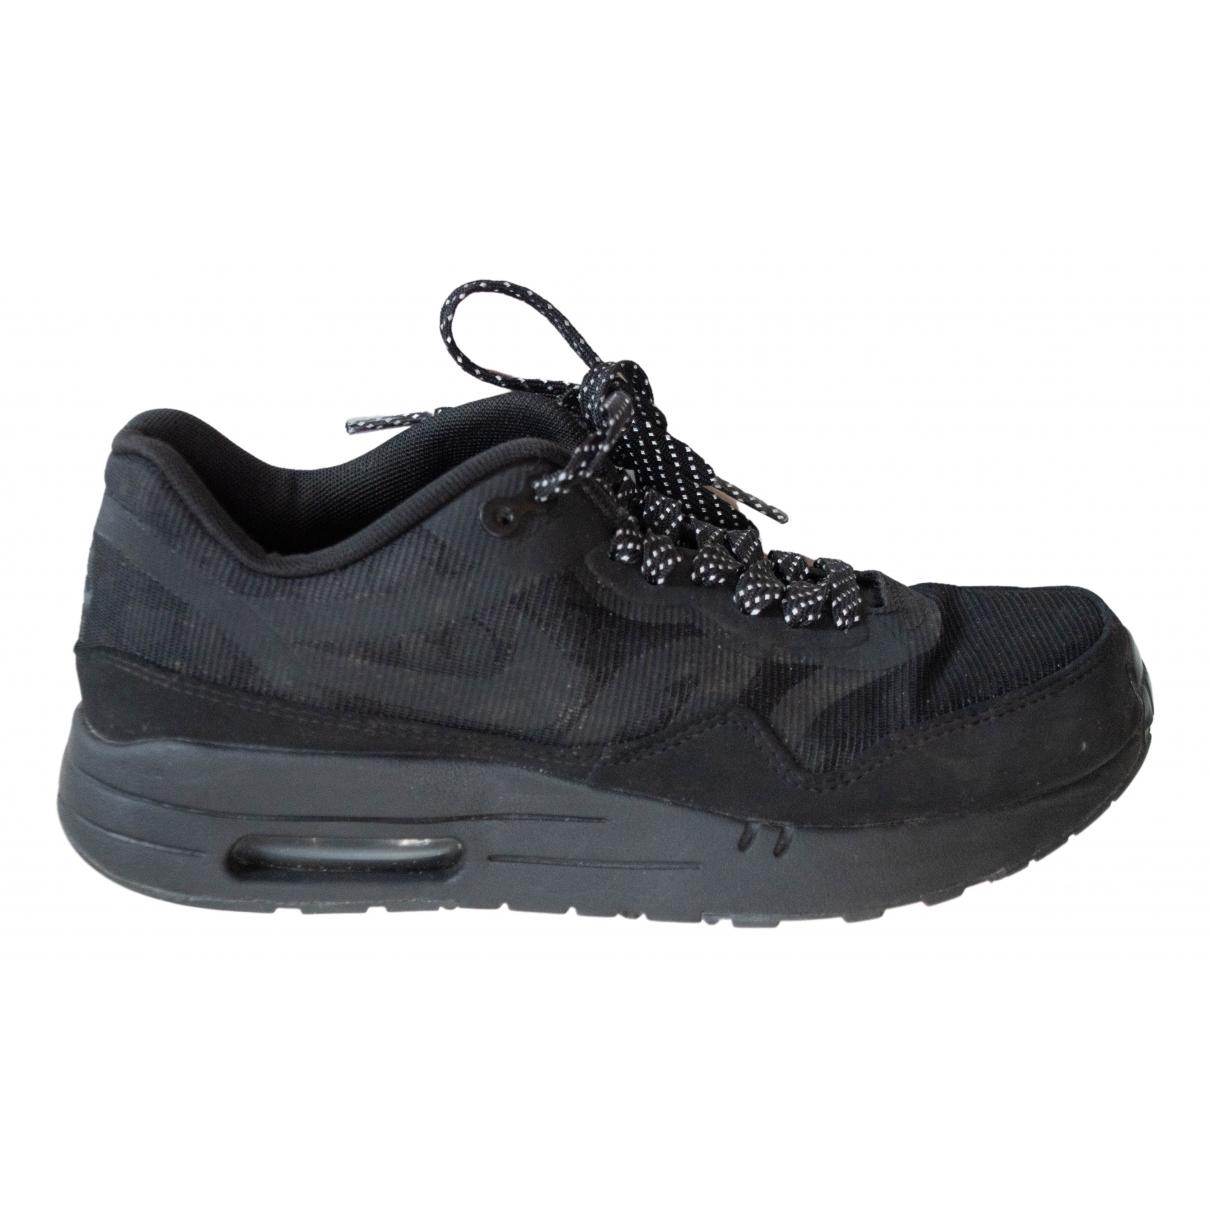 Nike Air Max 1 Black Cloth Trainers for Women 37.5 EU